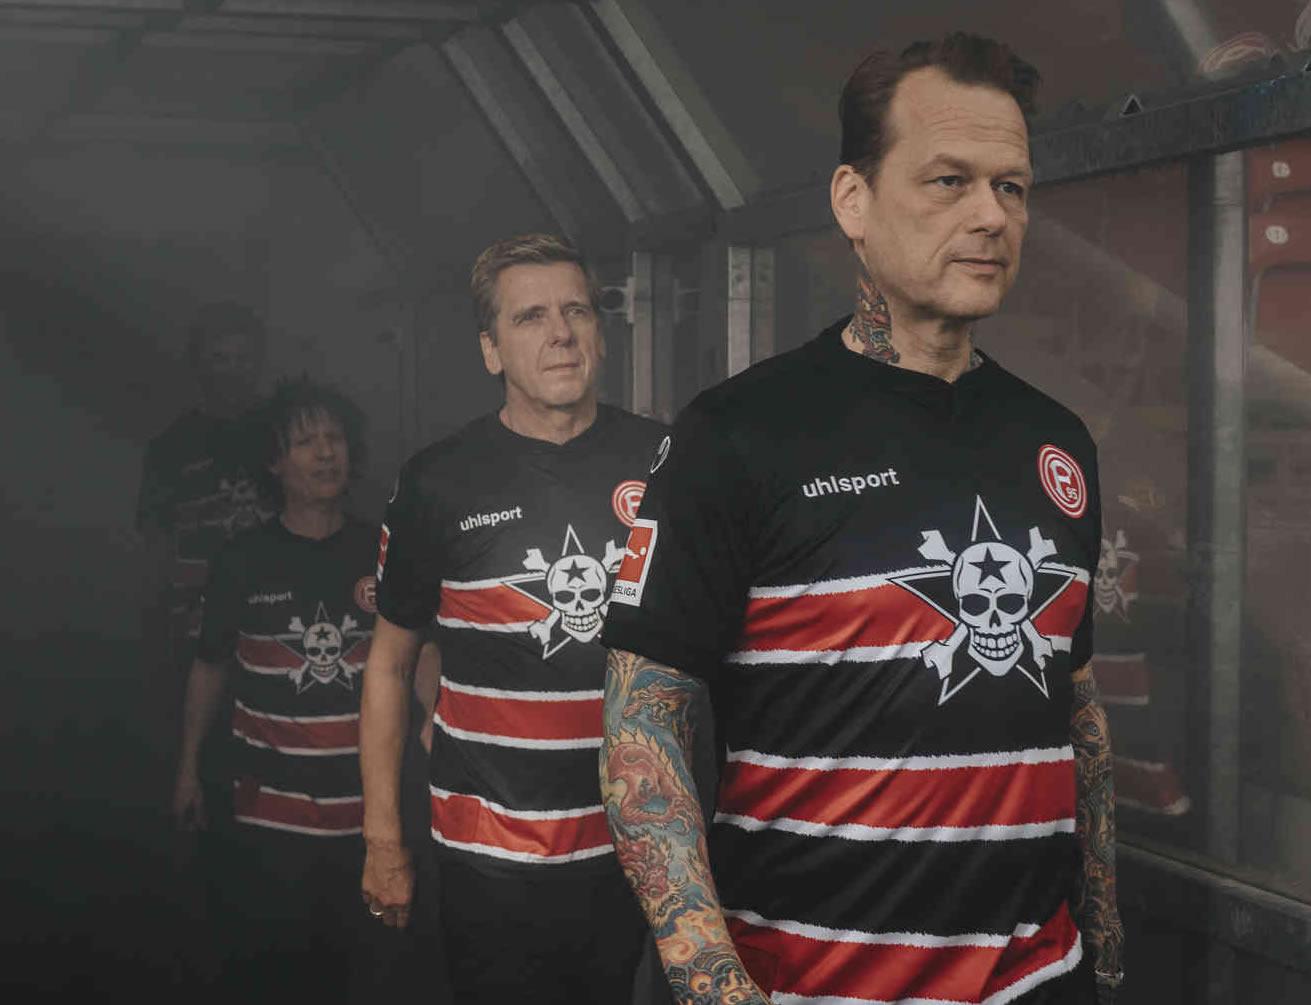 """Sondertrikot"" uhlsport del Fortuna Düsseldorf 2019/20   Imagen Web Oficial"